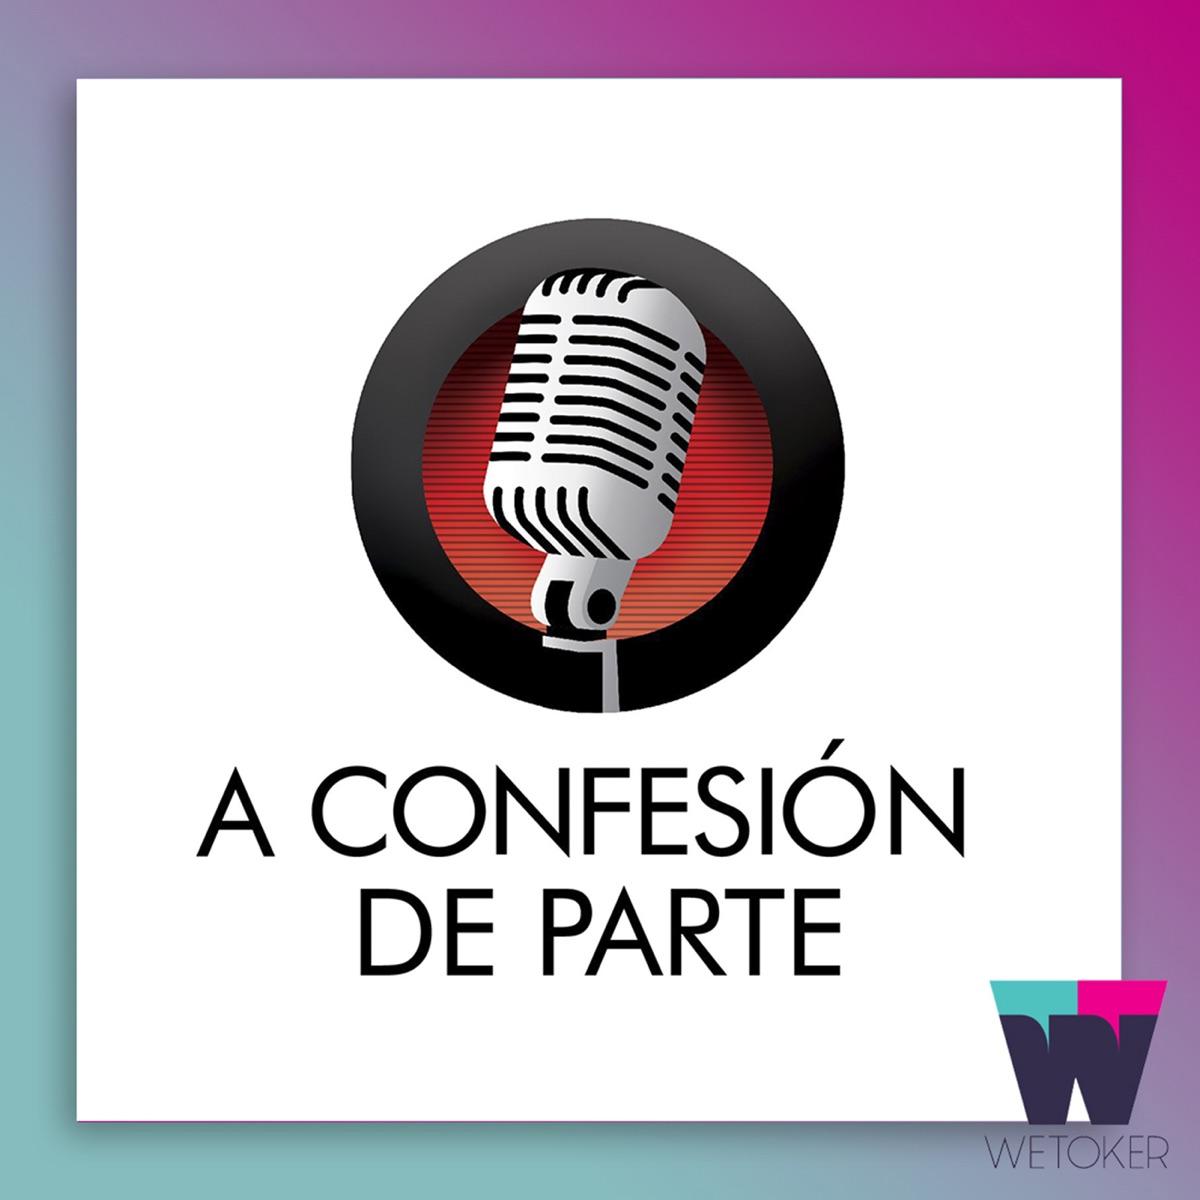 A confesión de parte